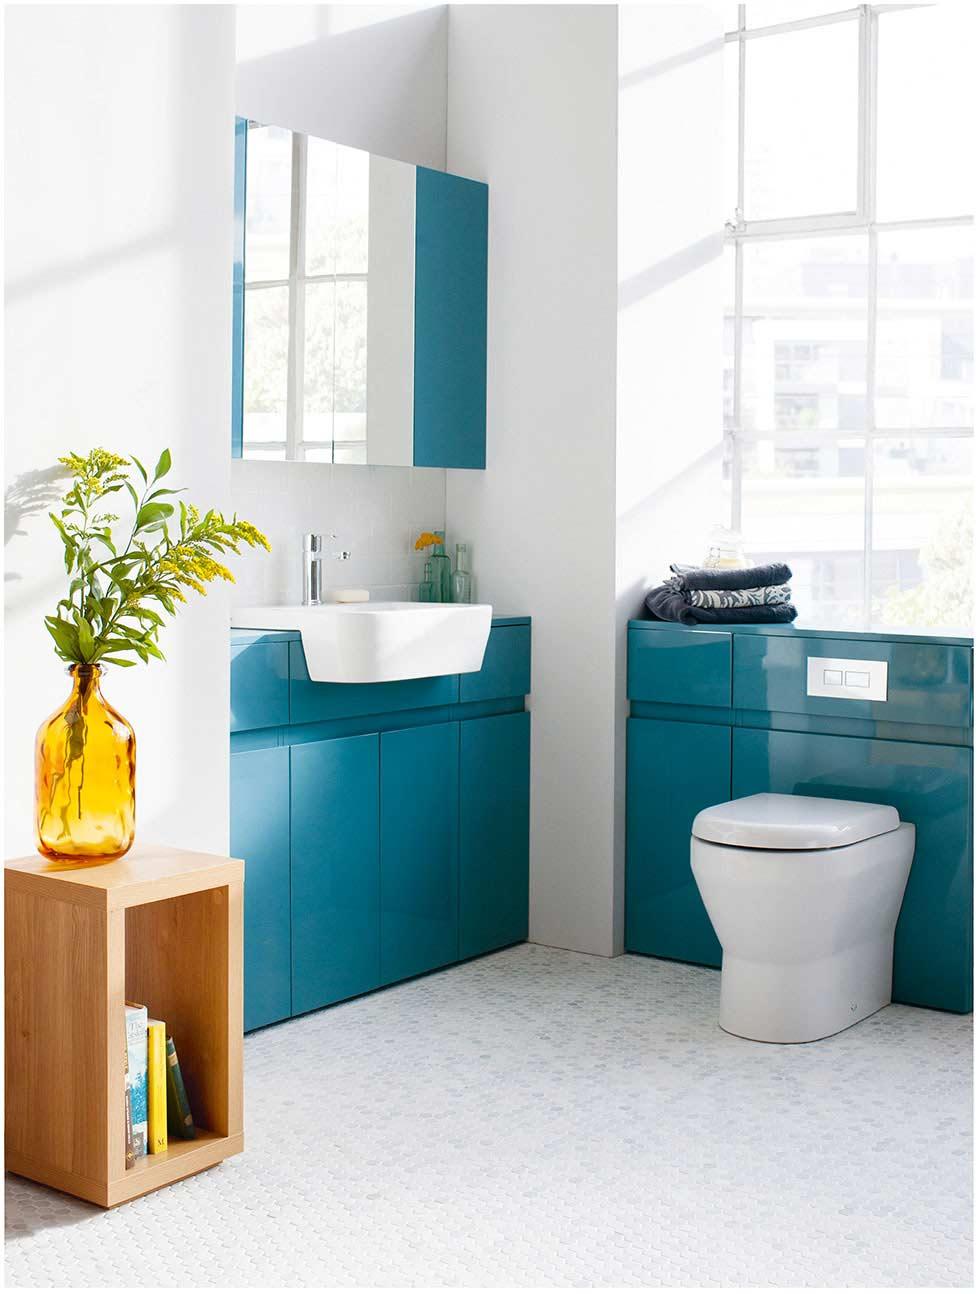 Great bathroom storage ideas - Real Homes